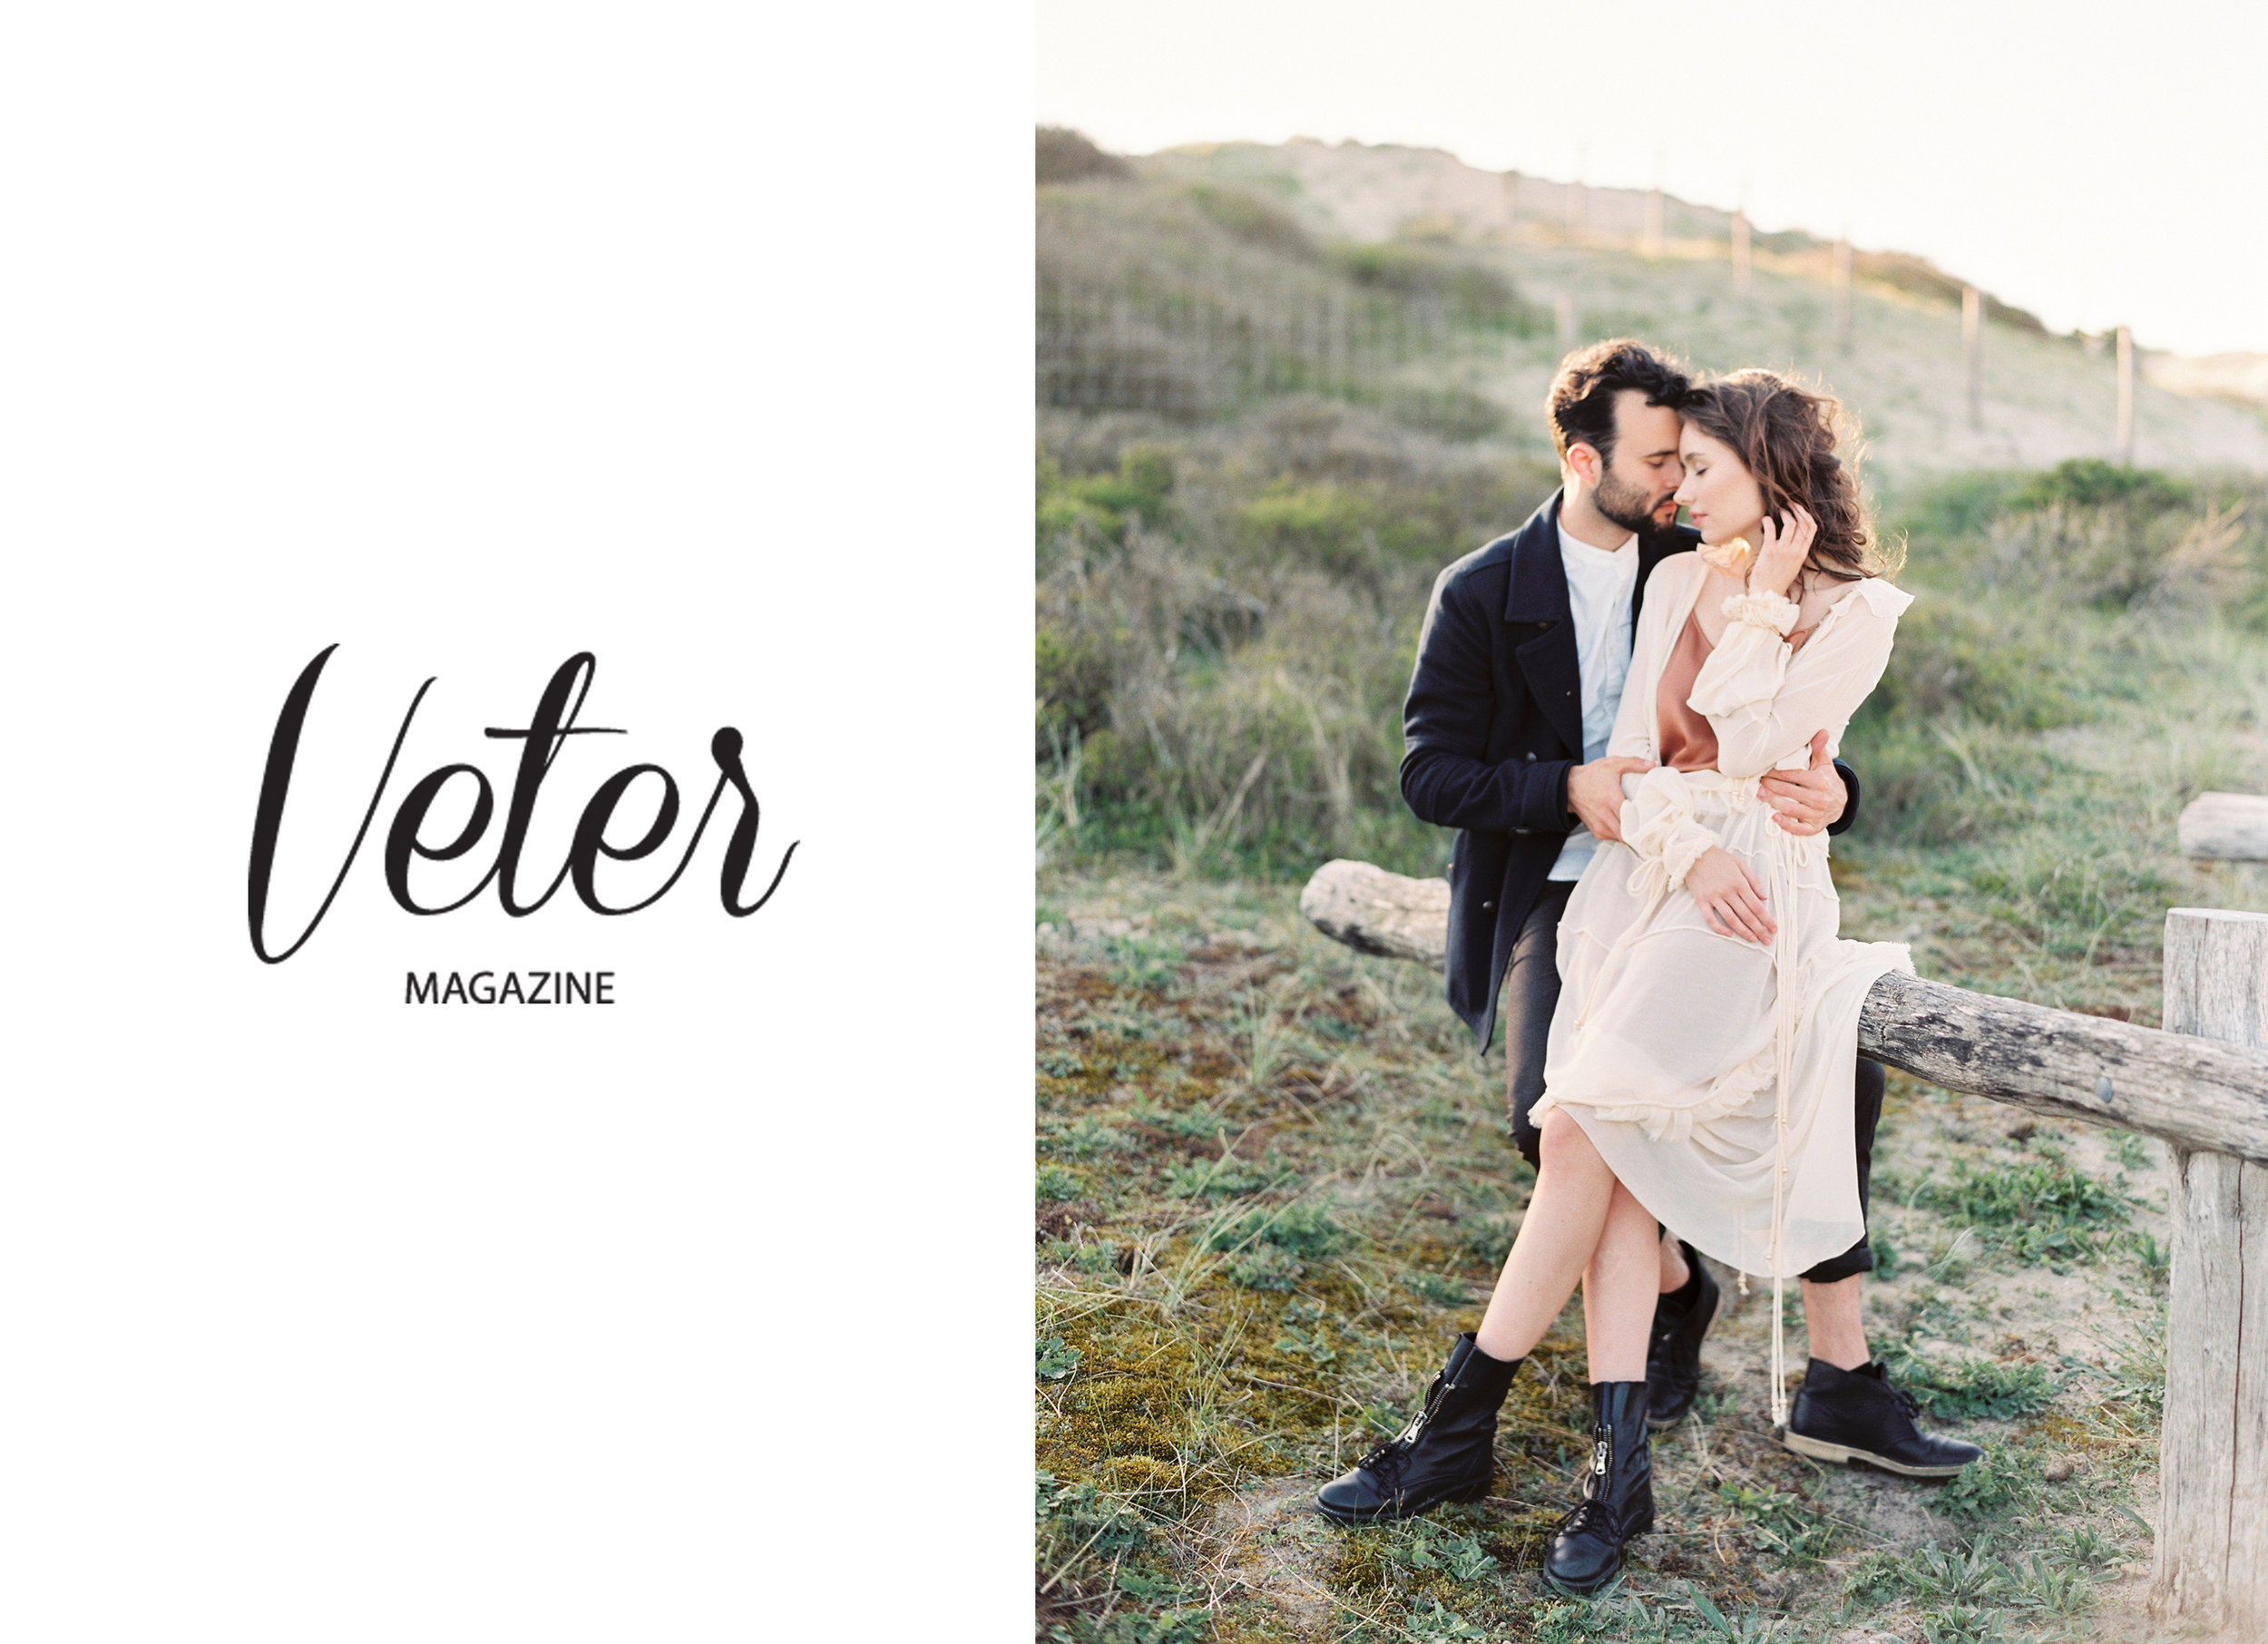 veter magazine - журнал Ветер by Nastia Vesna.jpg